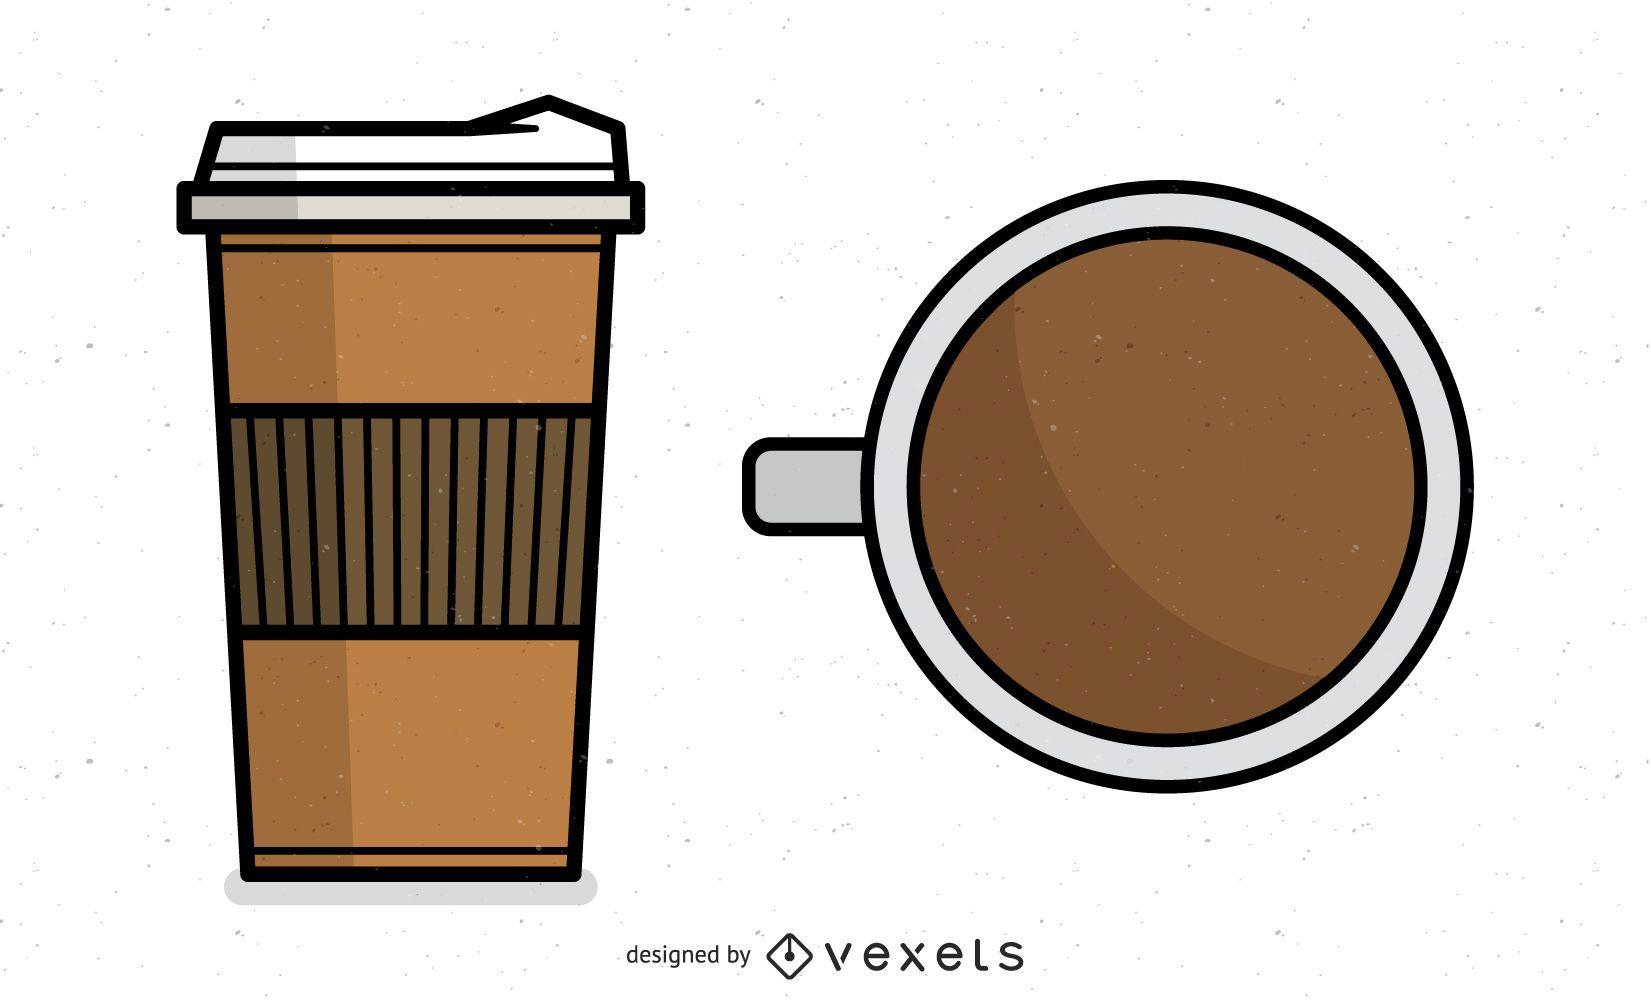 Coffee in Styrofoam Cup and Mug